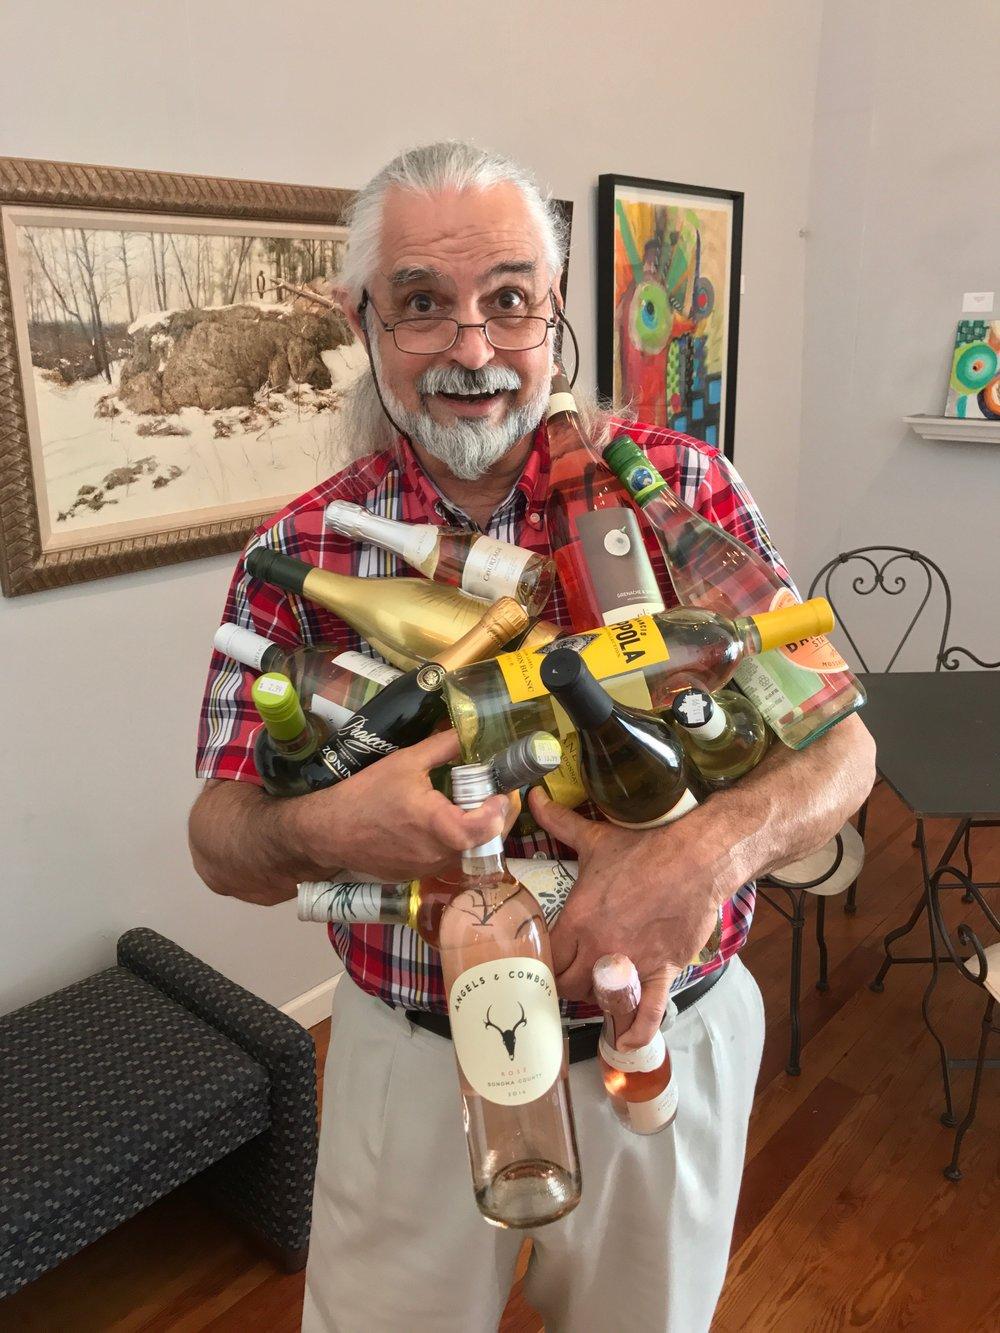 Meet Poppa Cork - Henry Foy, owner of Wine Emporium.